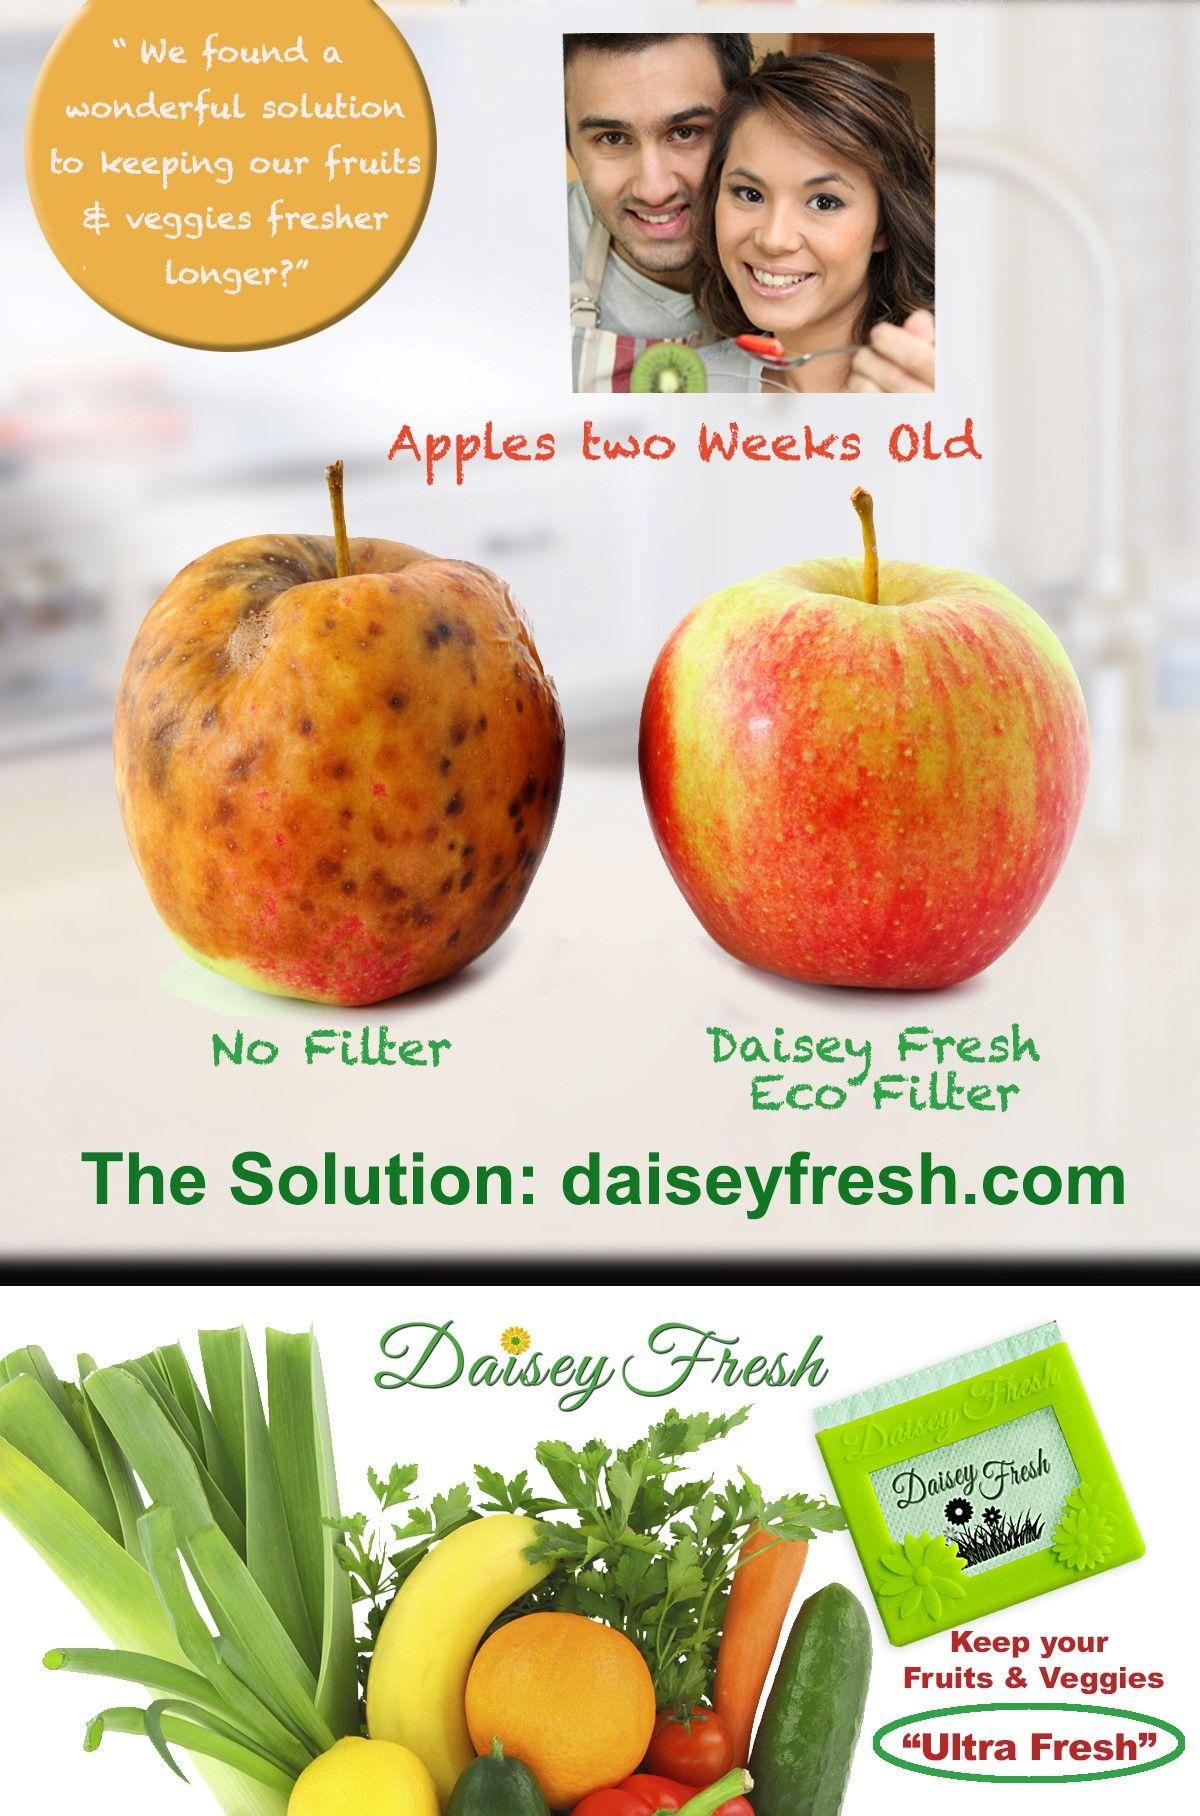 Daisey Fresh Eco Filter fresh freshness Get it at http